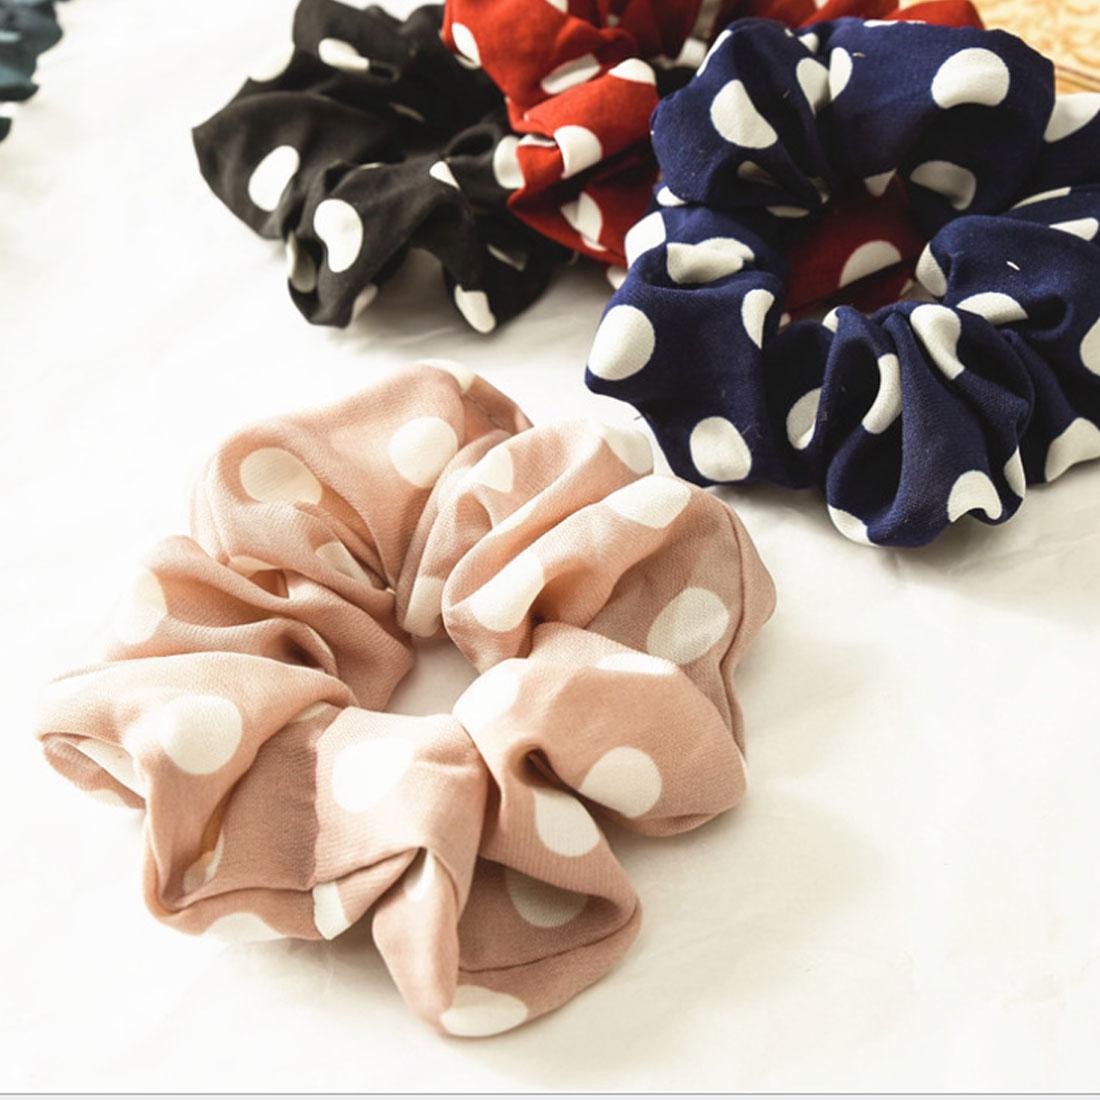 1PC Women Girls Elastic Hair Rope Ring Tie Scrunchie Ladies Chiffon Polka Dot Ponytail Holder Hairband Headwear Hair Accessories in Women 39 s Hair Accessories from Apparel Accessories